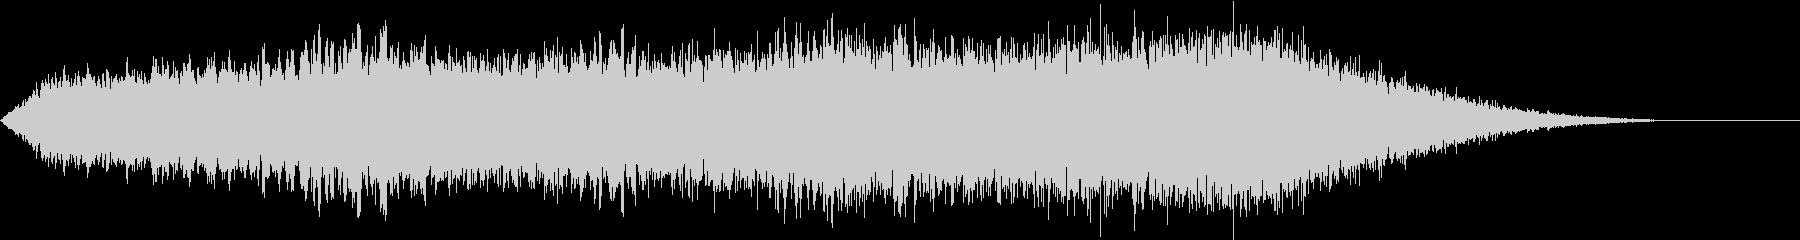 CINEMATIC RISER_29の未再生の波形